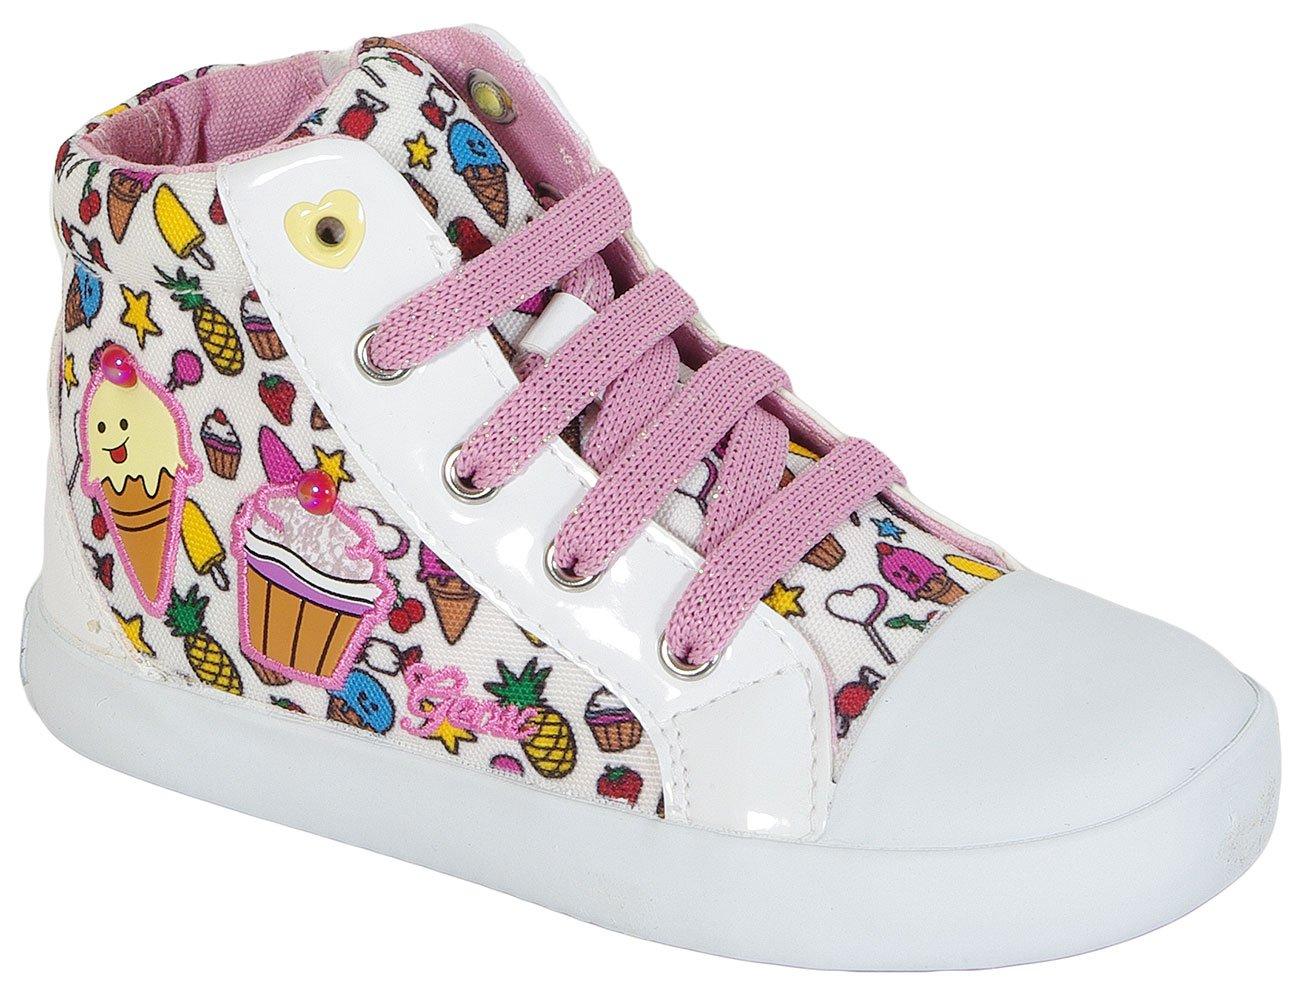 GEOX Kiwi G F T White/Multi sneakers